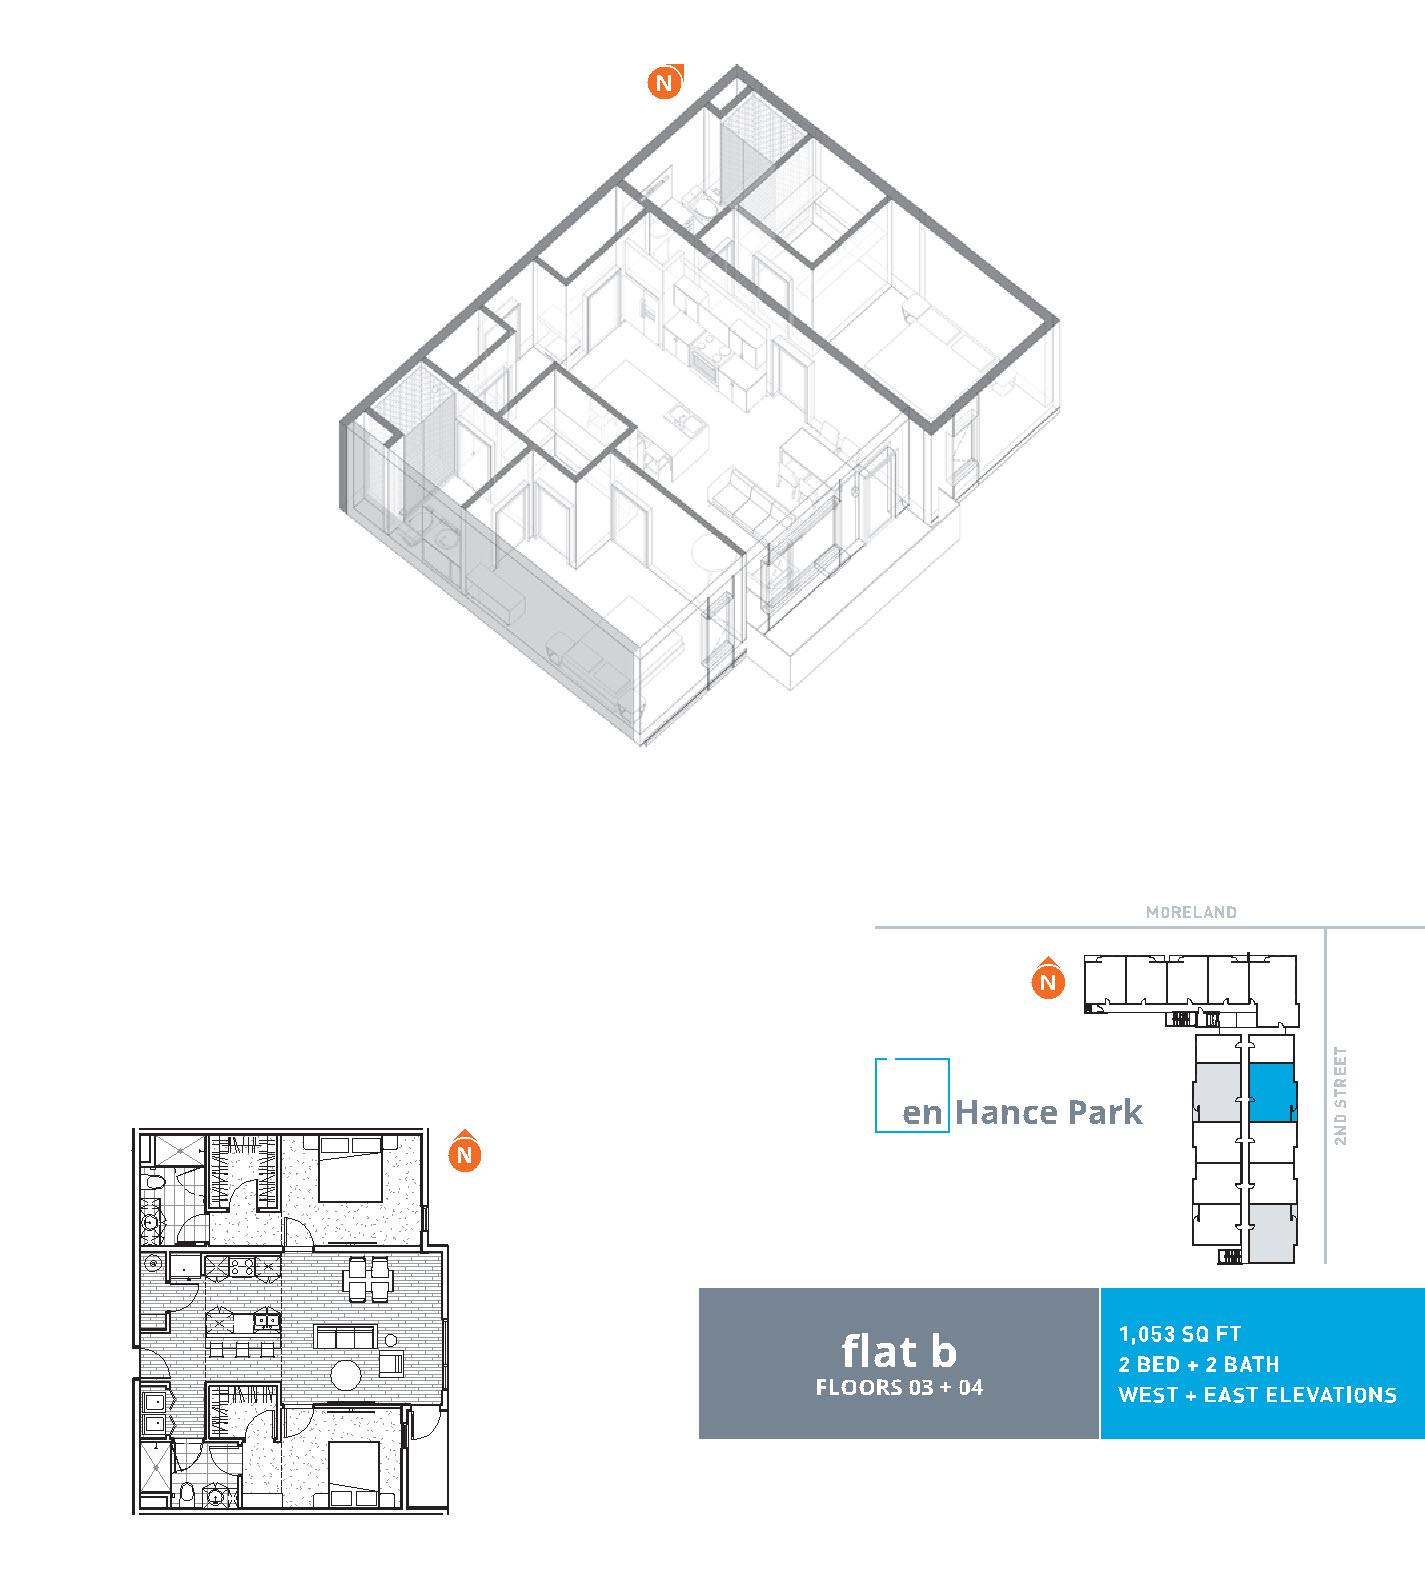 En hance park condo floor plan flat b 2bd